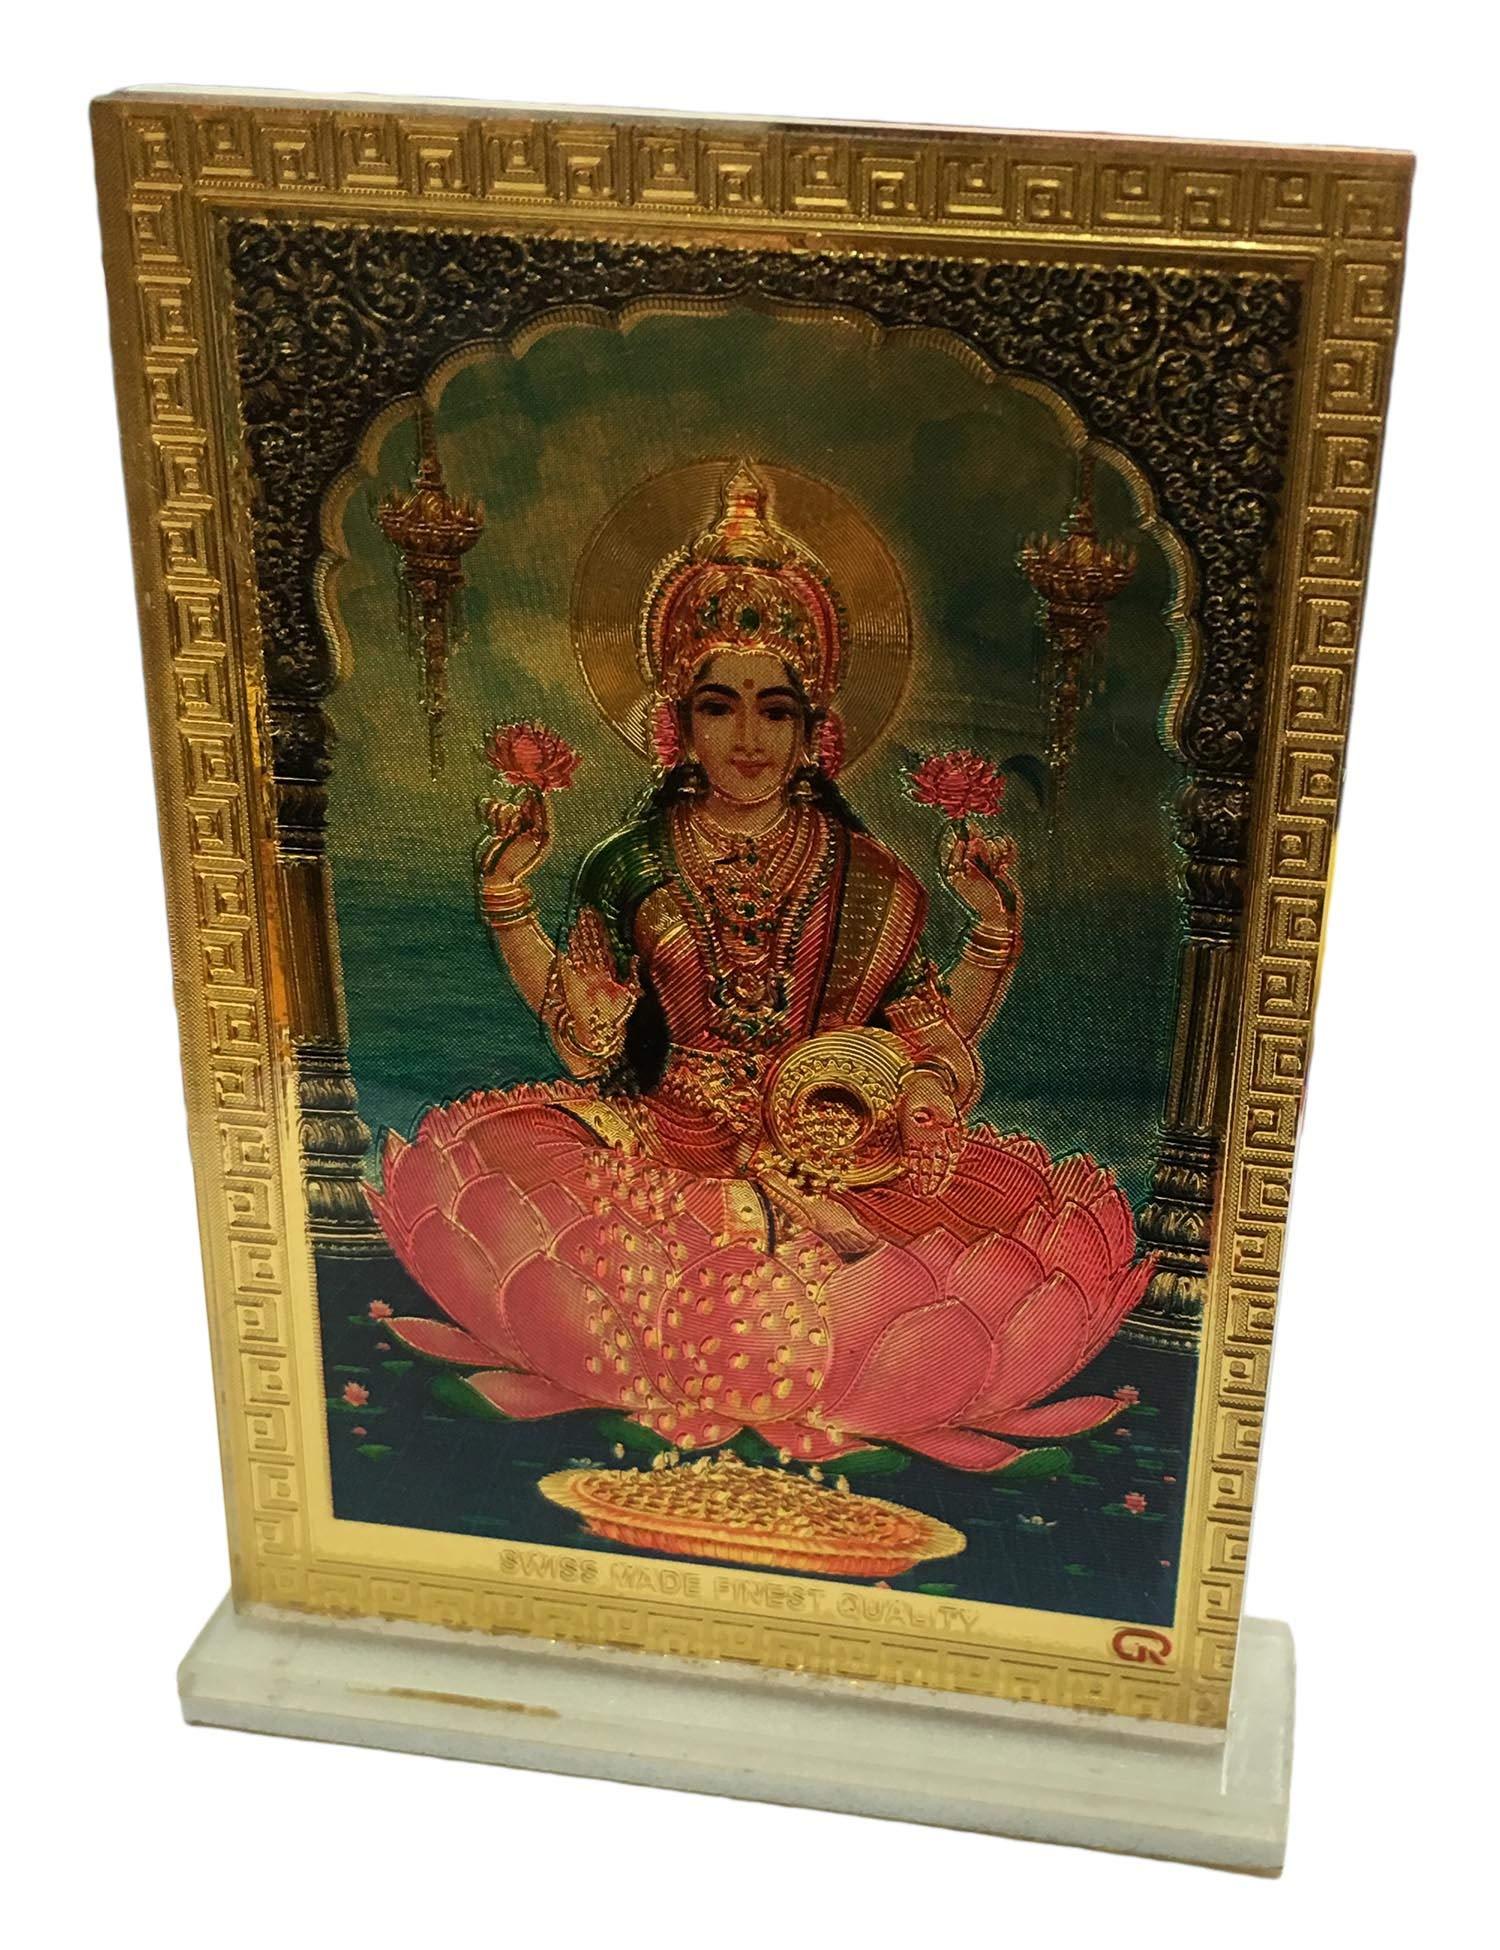 Padma Craft Lakshmi Goddess of Prosperity Desk Dashboard Gold Acrylic Frame Art Hindu Altar Yoga Meditation Accessory Gift